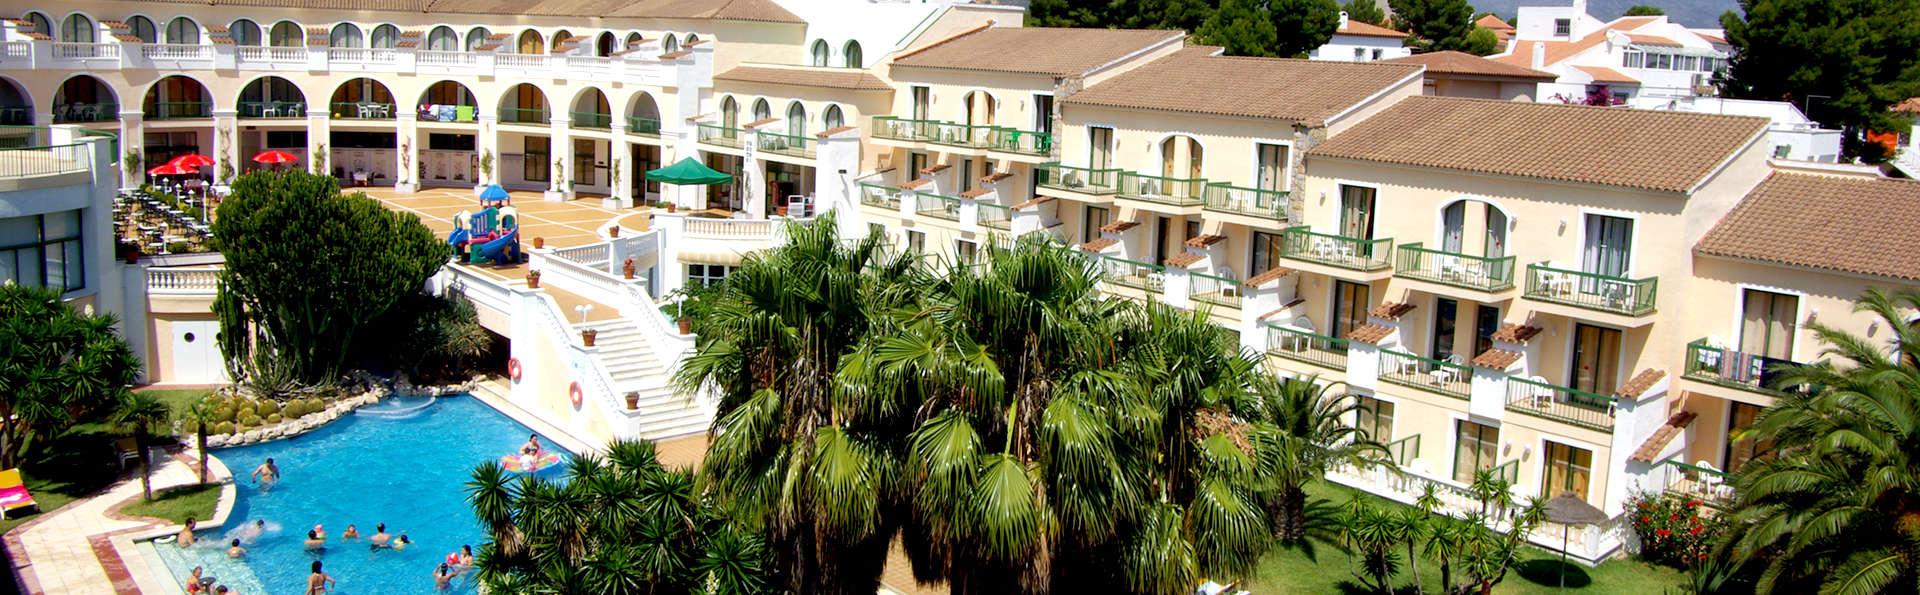 Hotel Pino Alto - Edit_View2.jpg